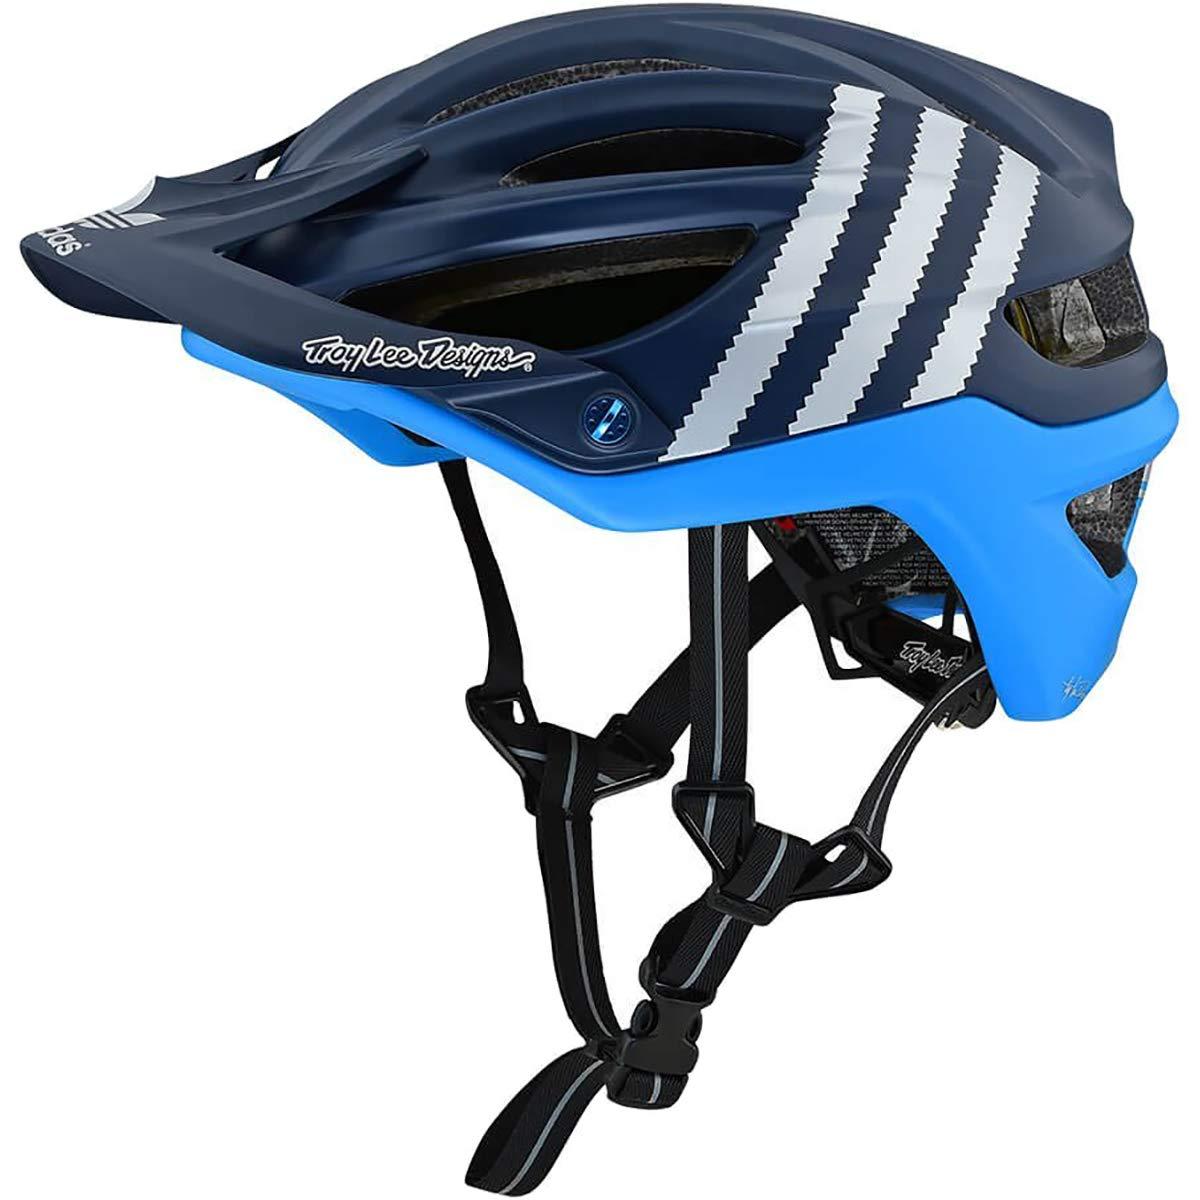 Troy Lee Designs A2 MIPS Helmet Adidas Team Navy/Light Blue, XL/XXL